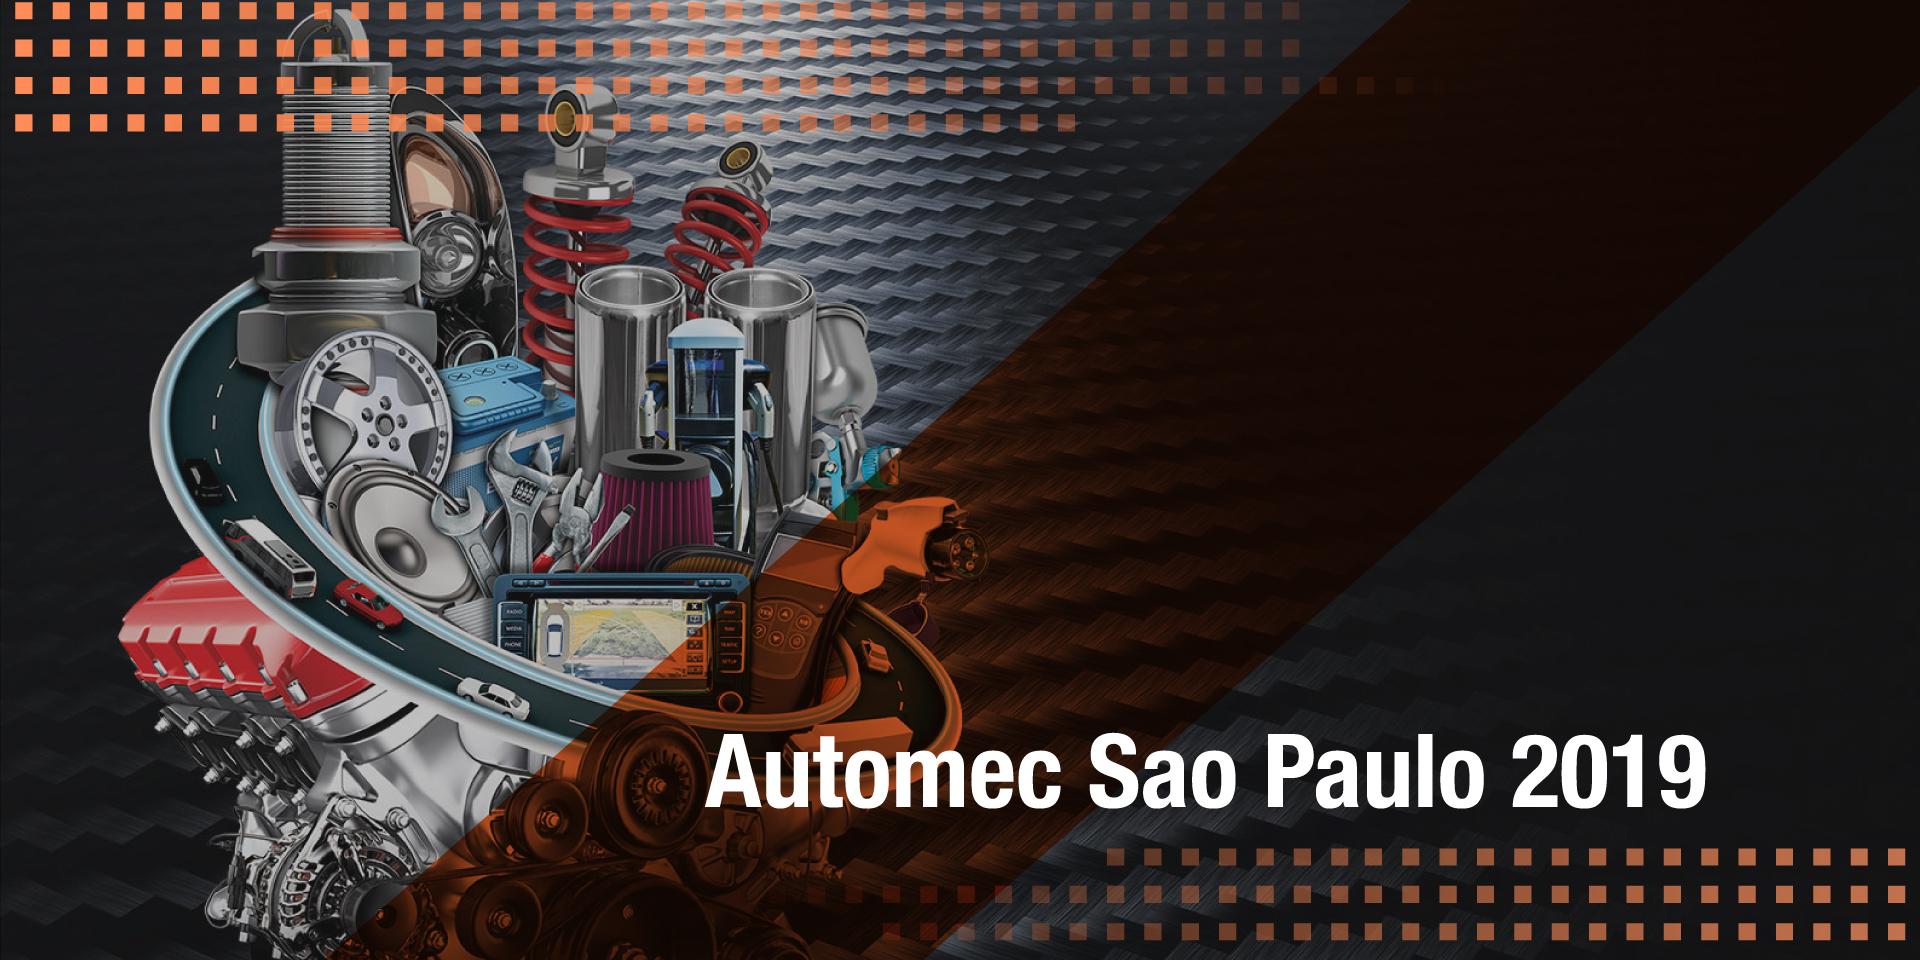 Automec Sao Paulo 2019